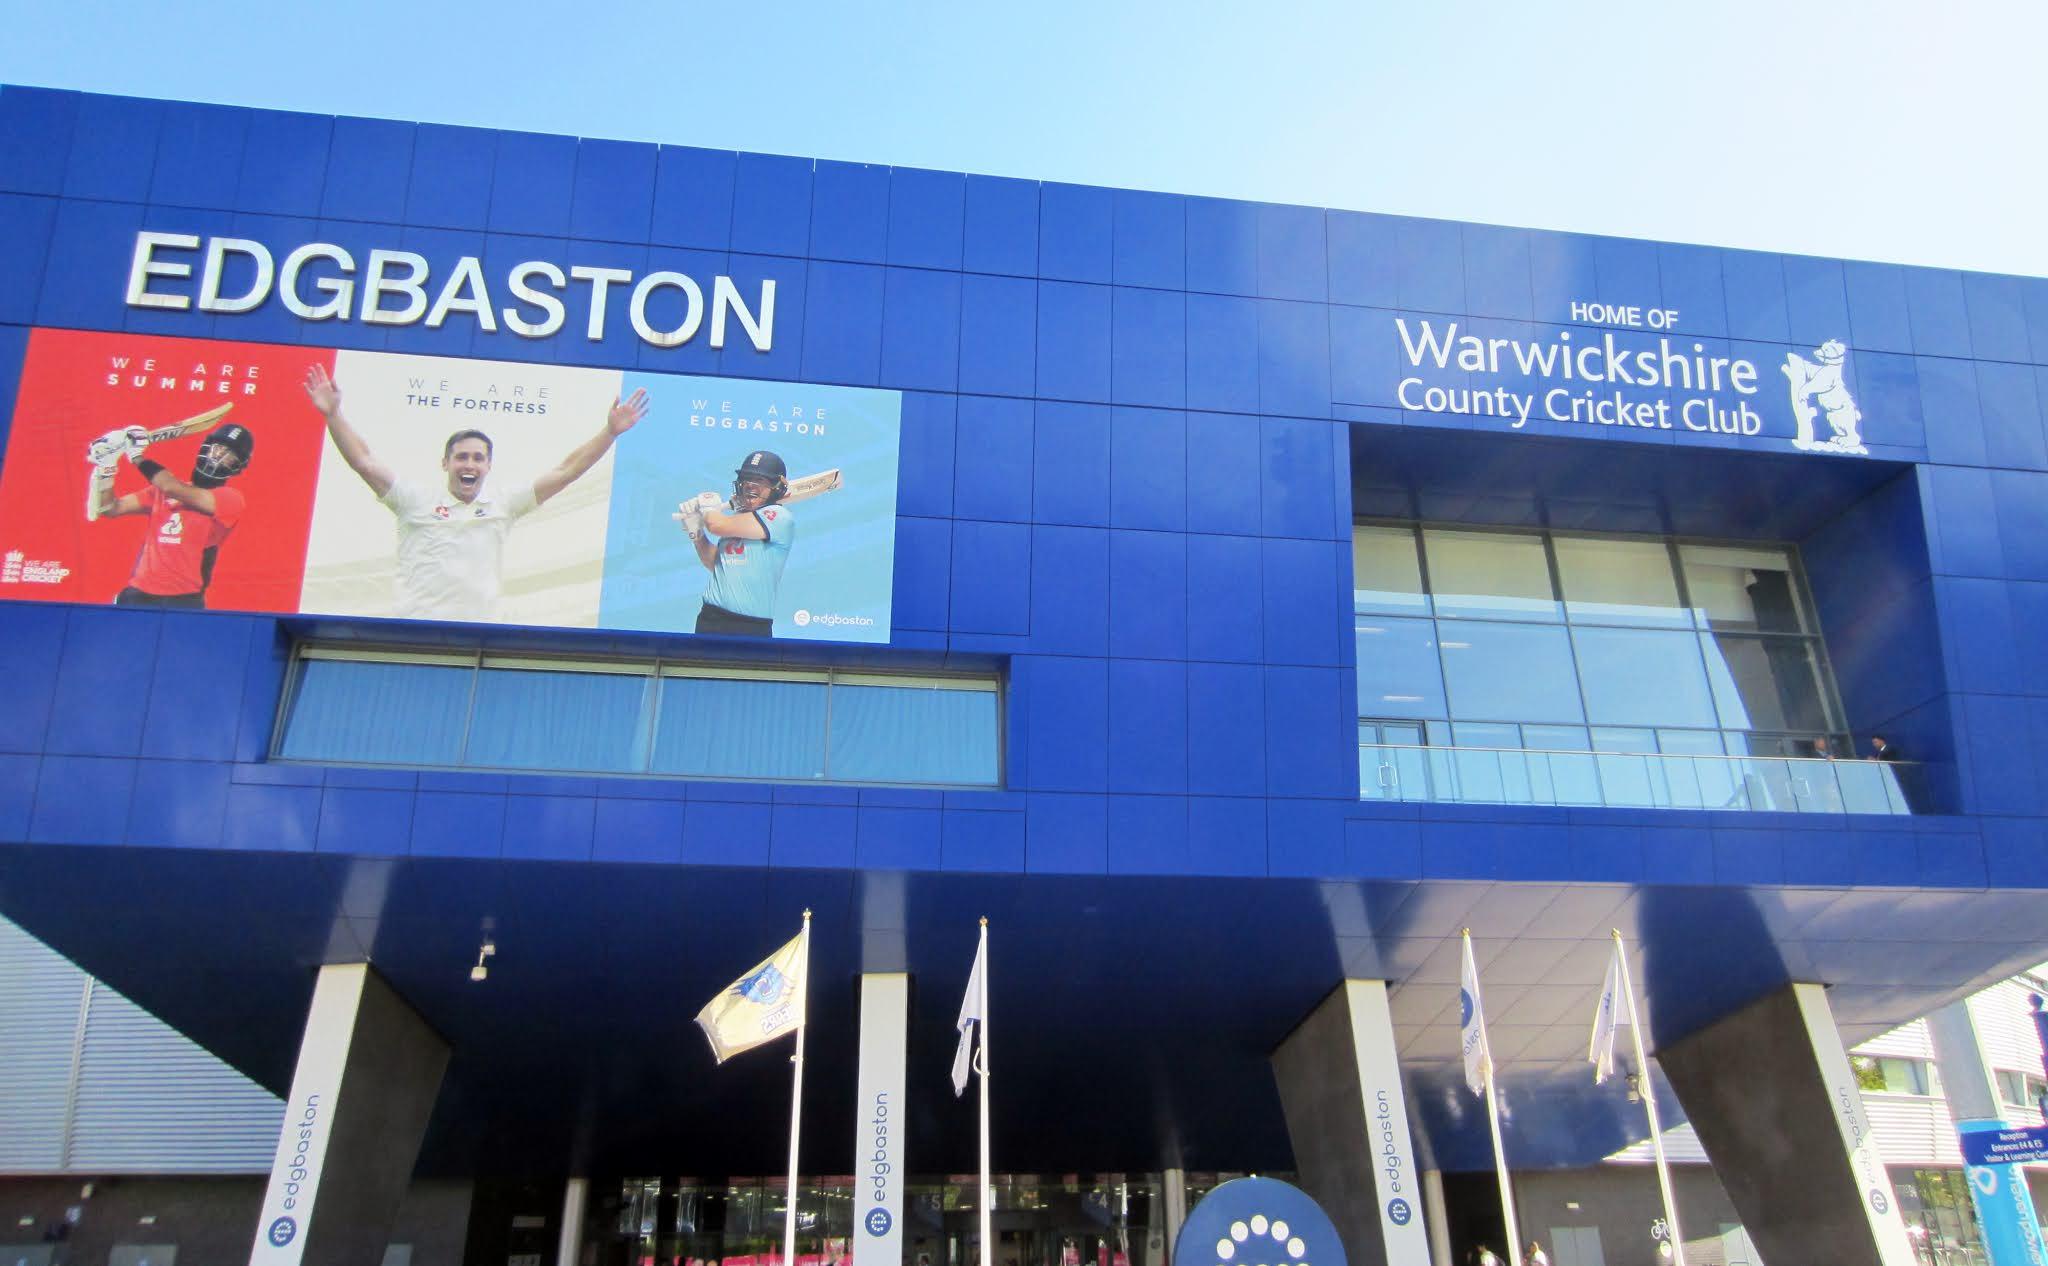 Edgbaston Stadium main entrance